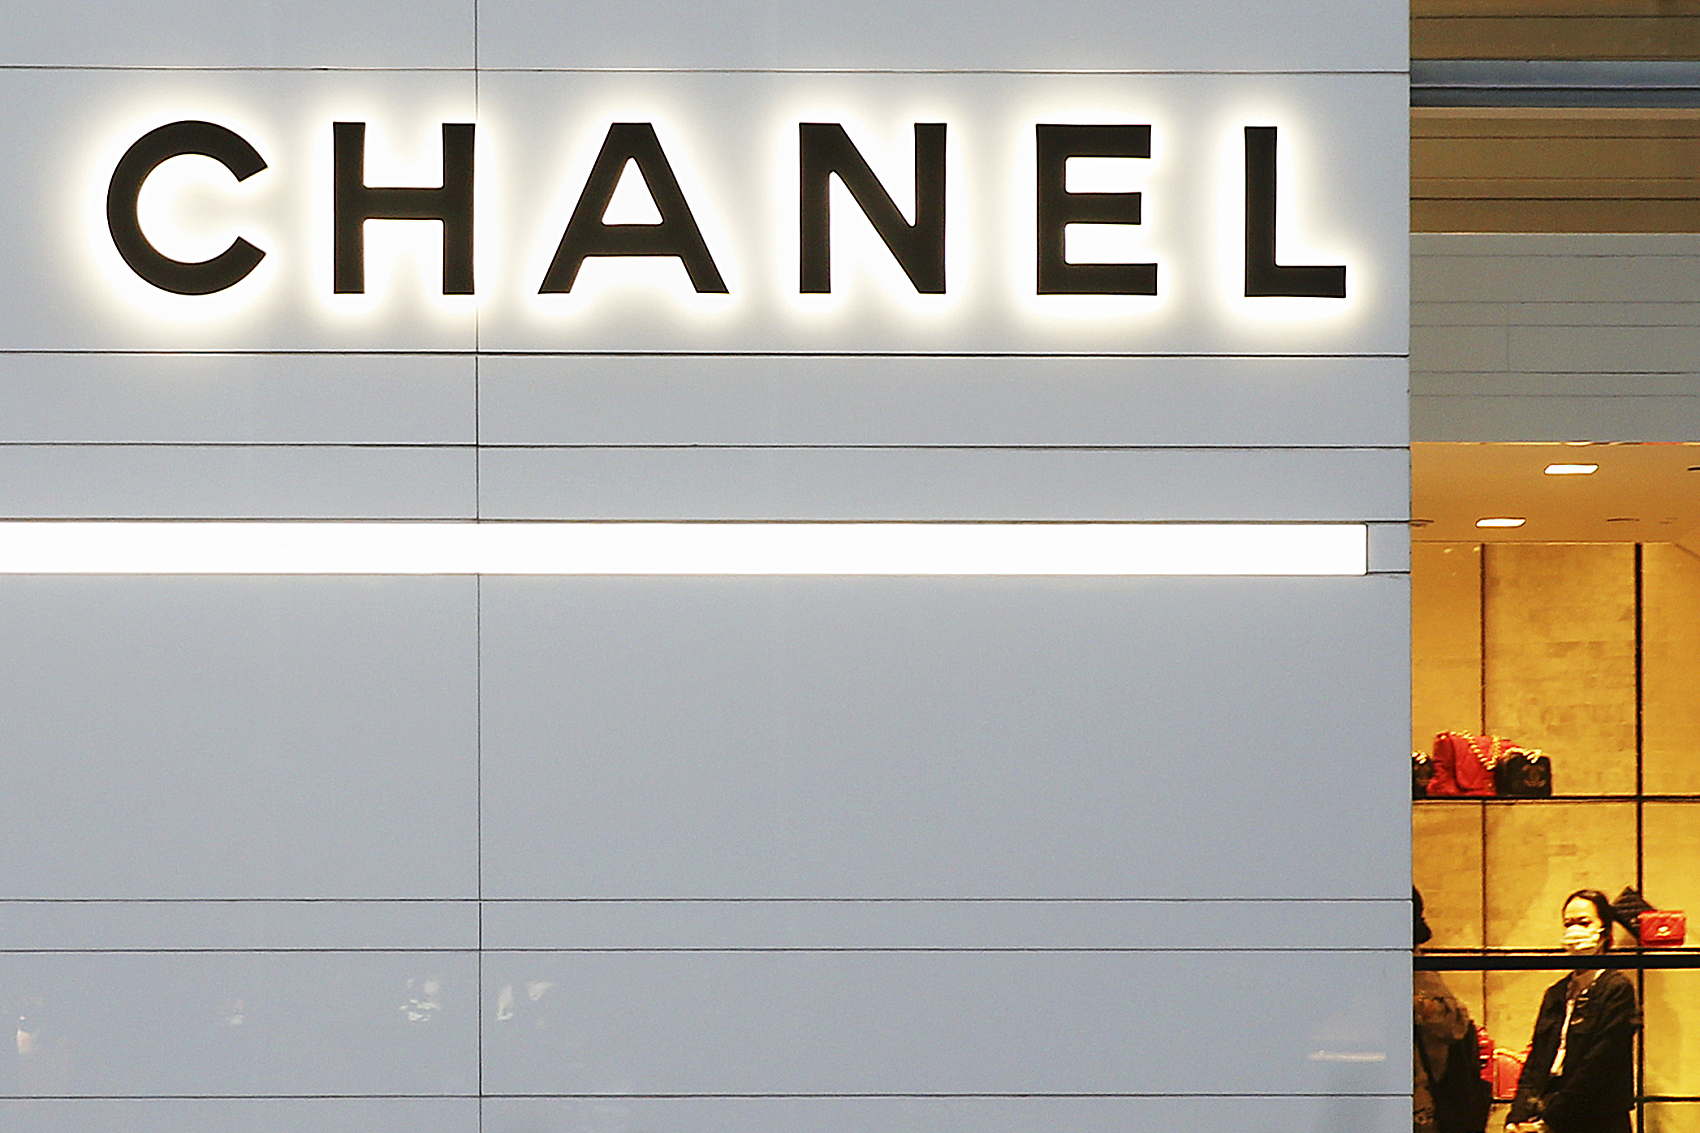 CHANEL fined for false advertising: market regulators